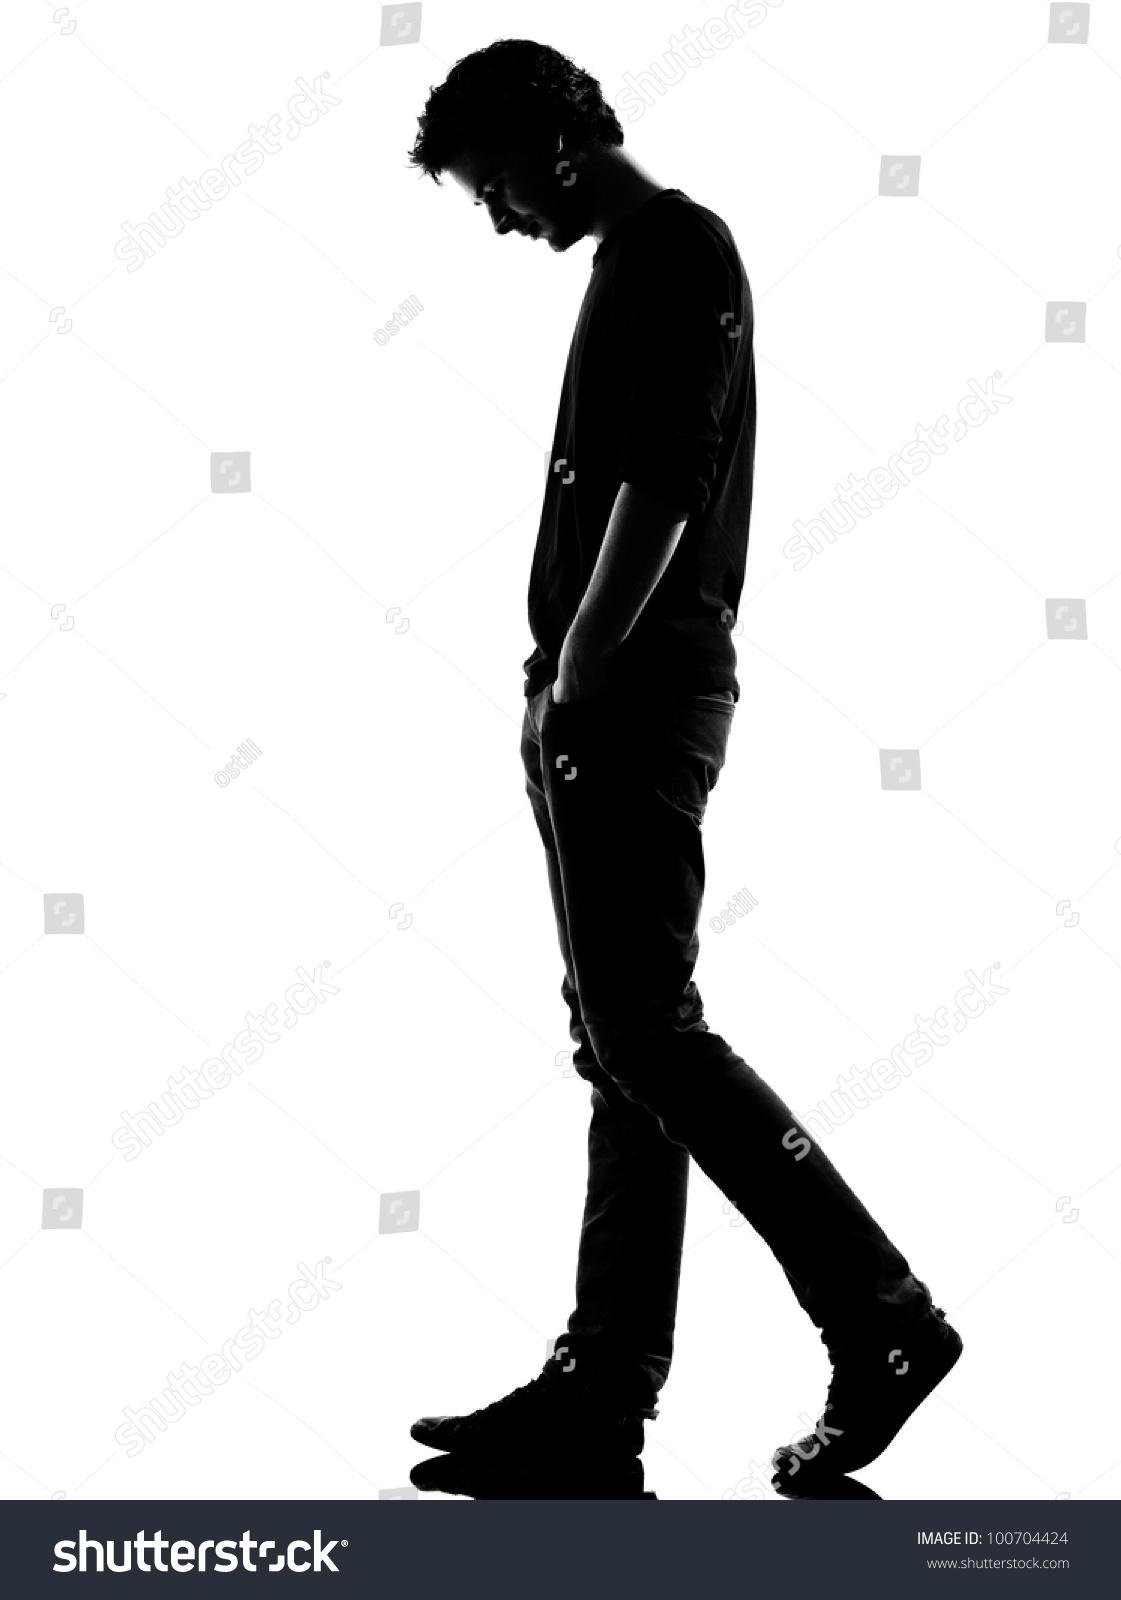 Young man sad walking silhouette studio stock photo royalty free young man sad walking silhouette in studio isolated on white background altavistaventures Gallery